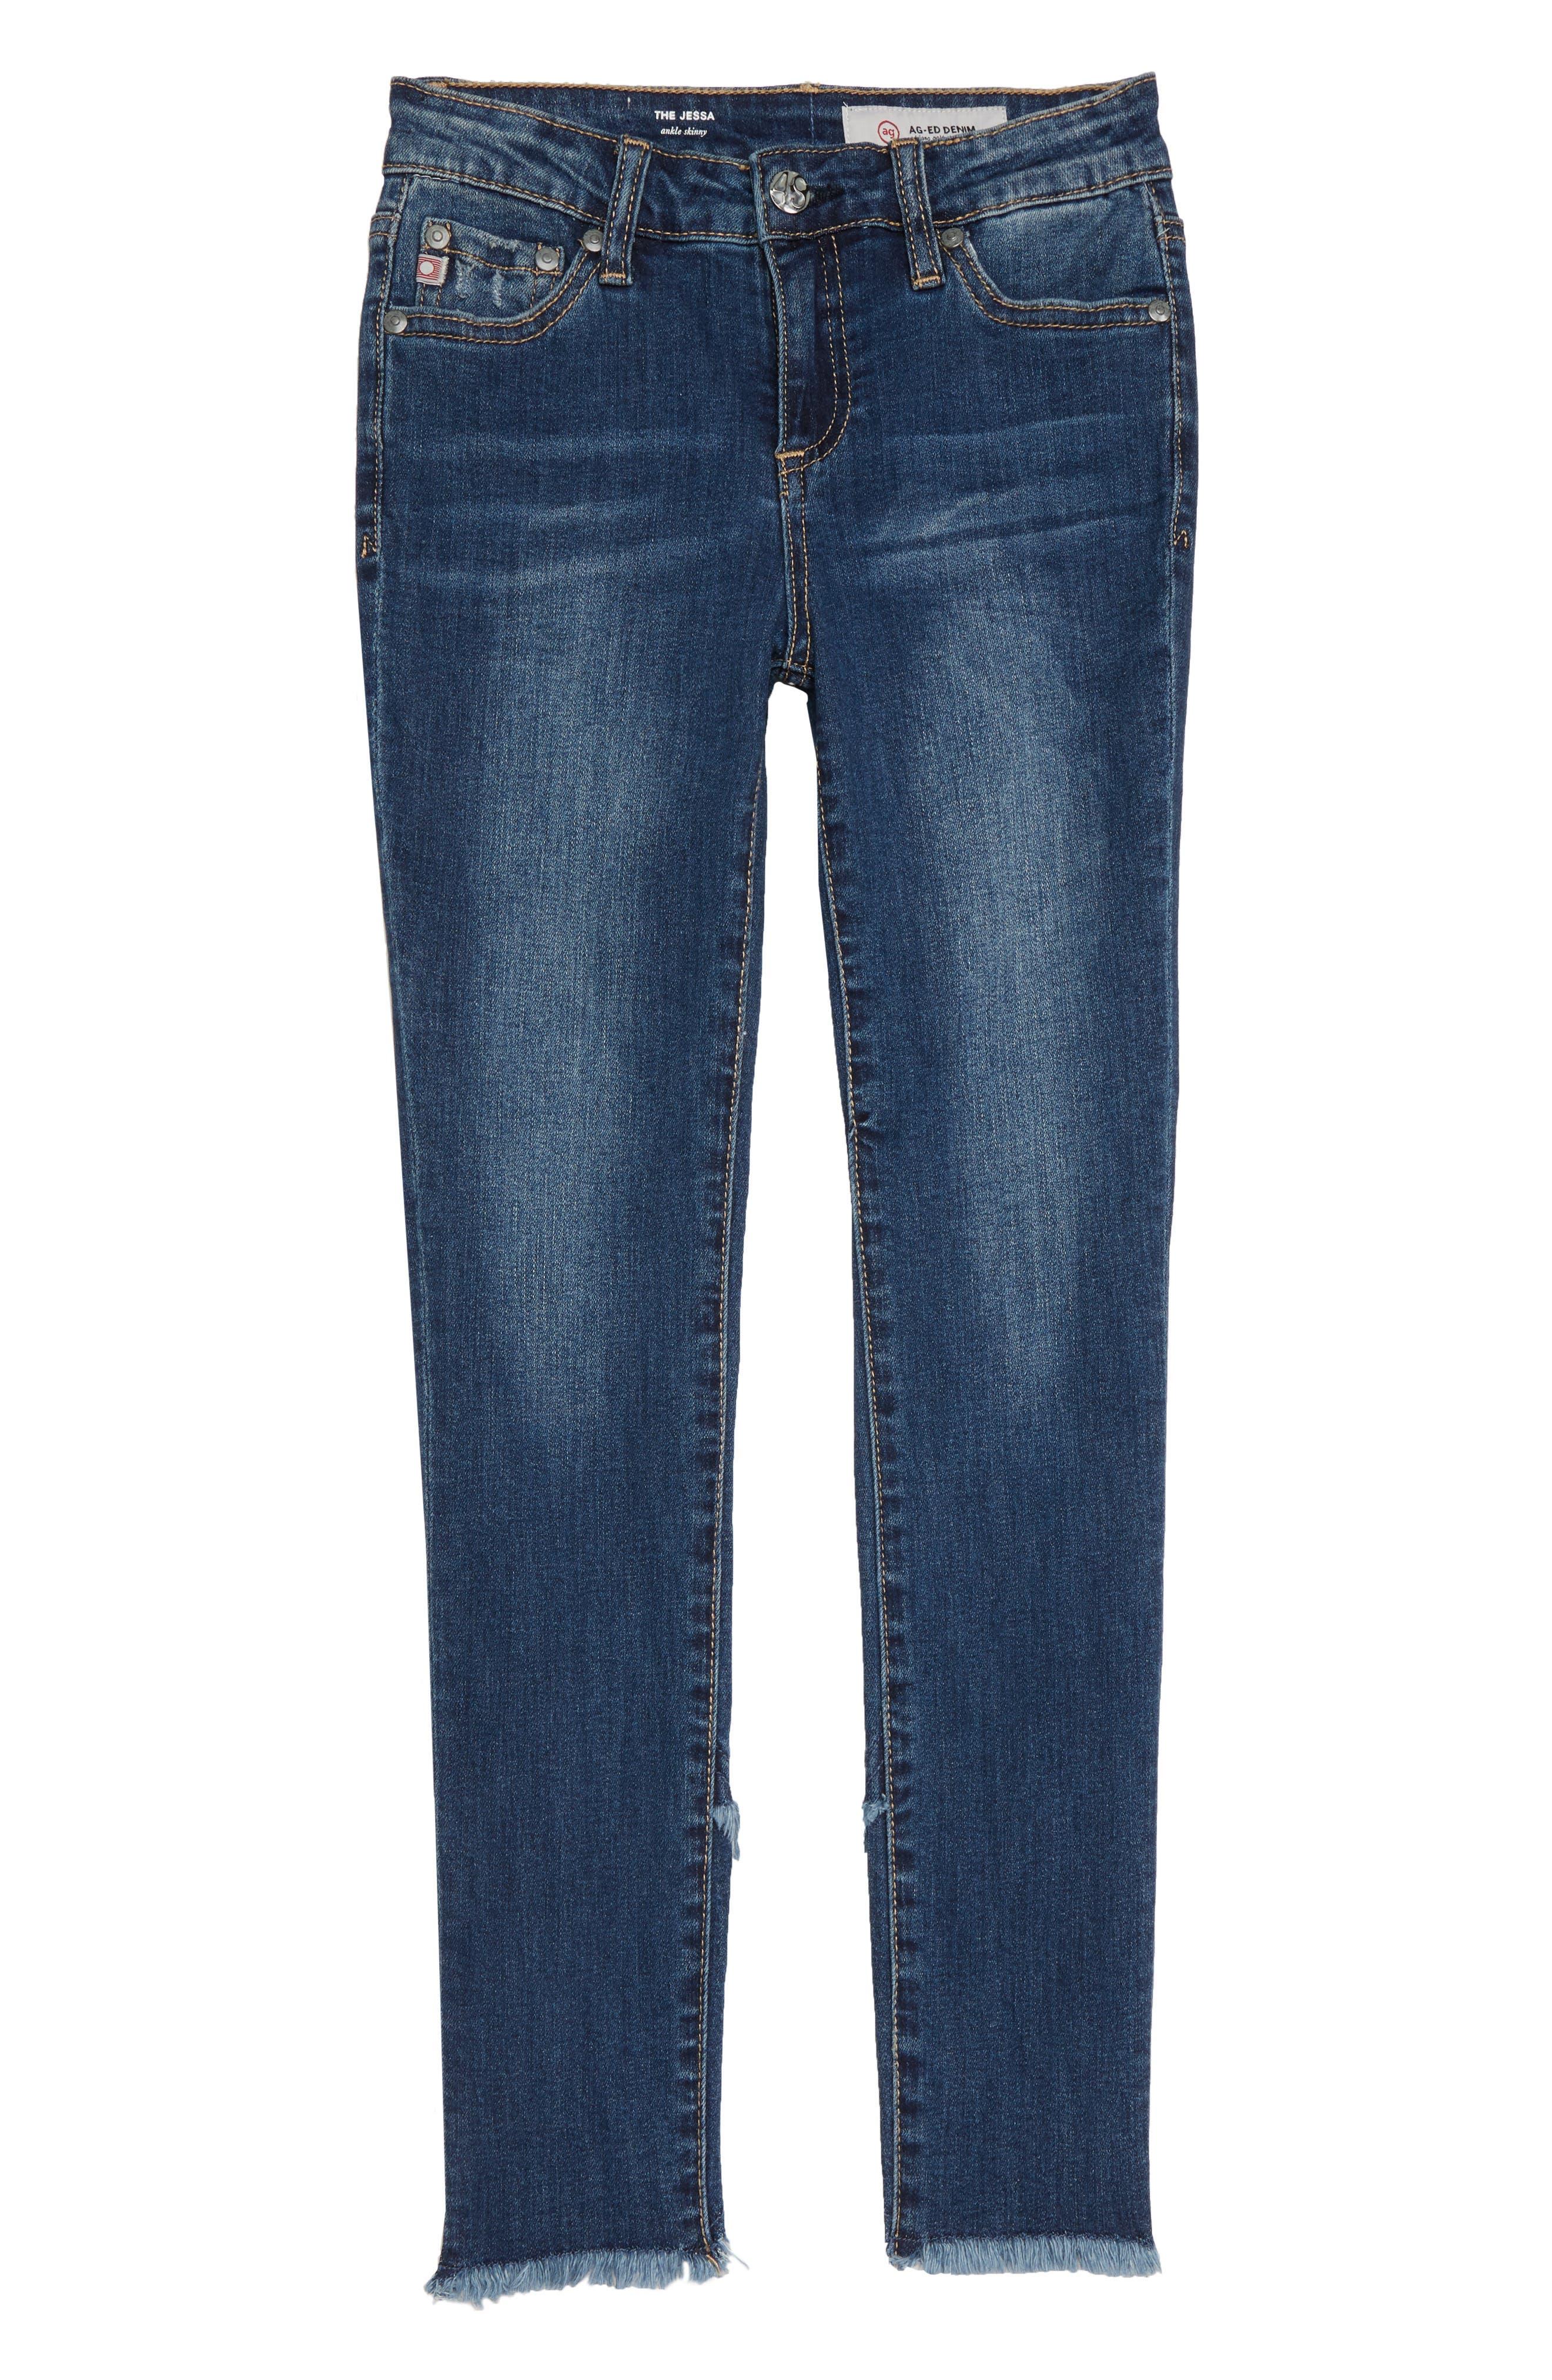 Girls Ag Adriano Goldschmied Kids The Jessa Tulip Hem Ankle Jeans Size 14  Blue